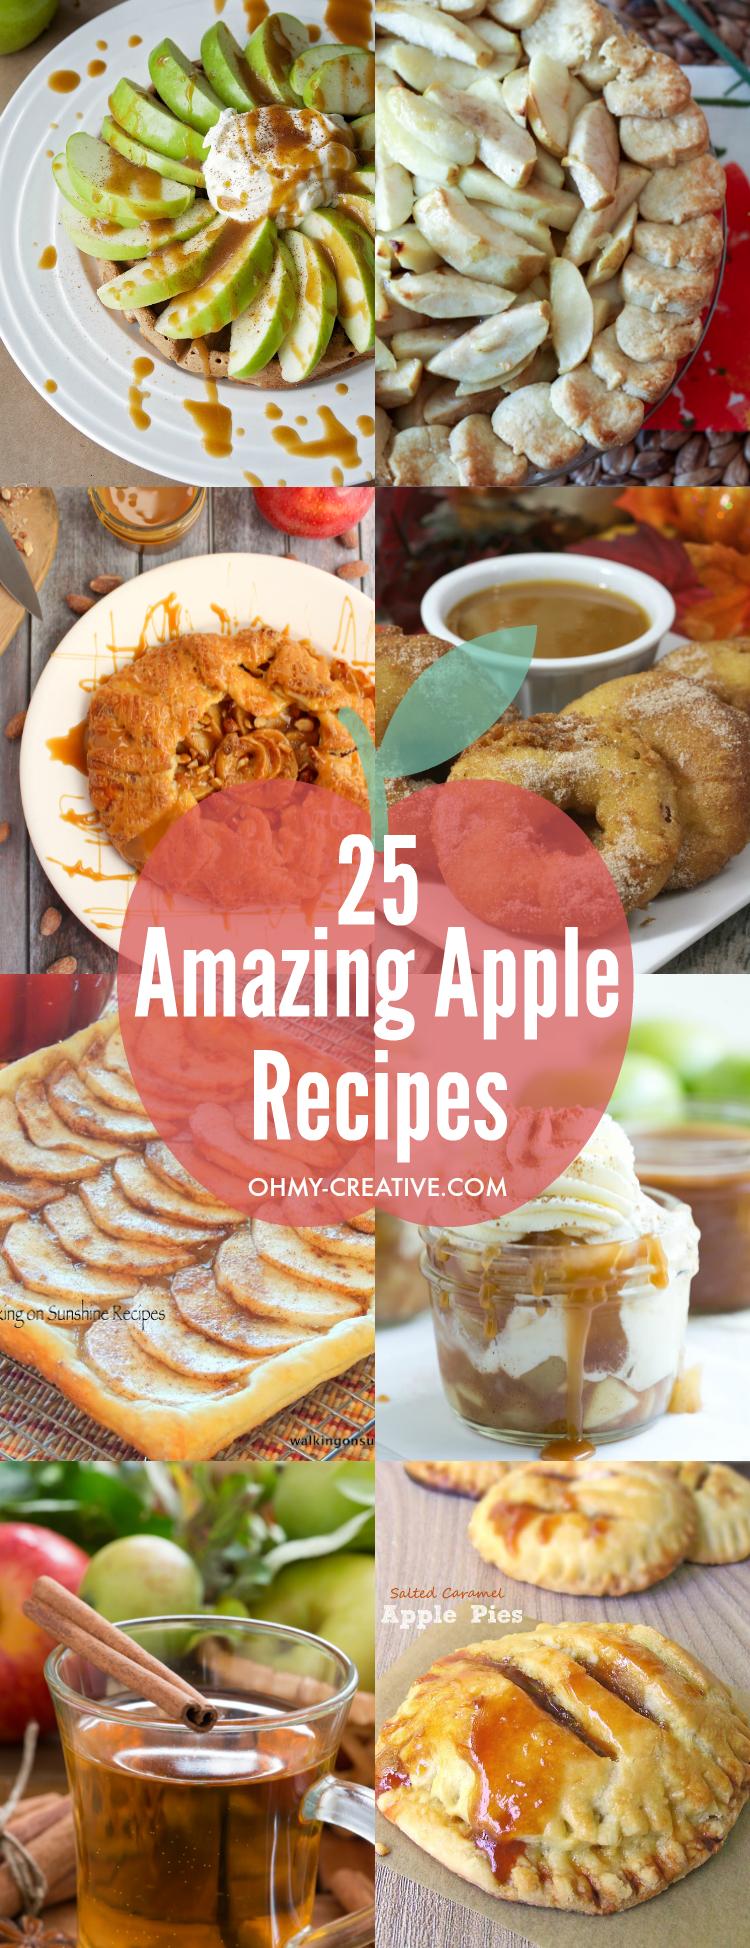 25 Amazing Apple Recipes